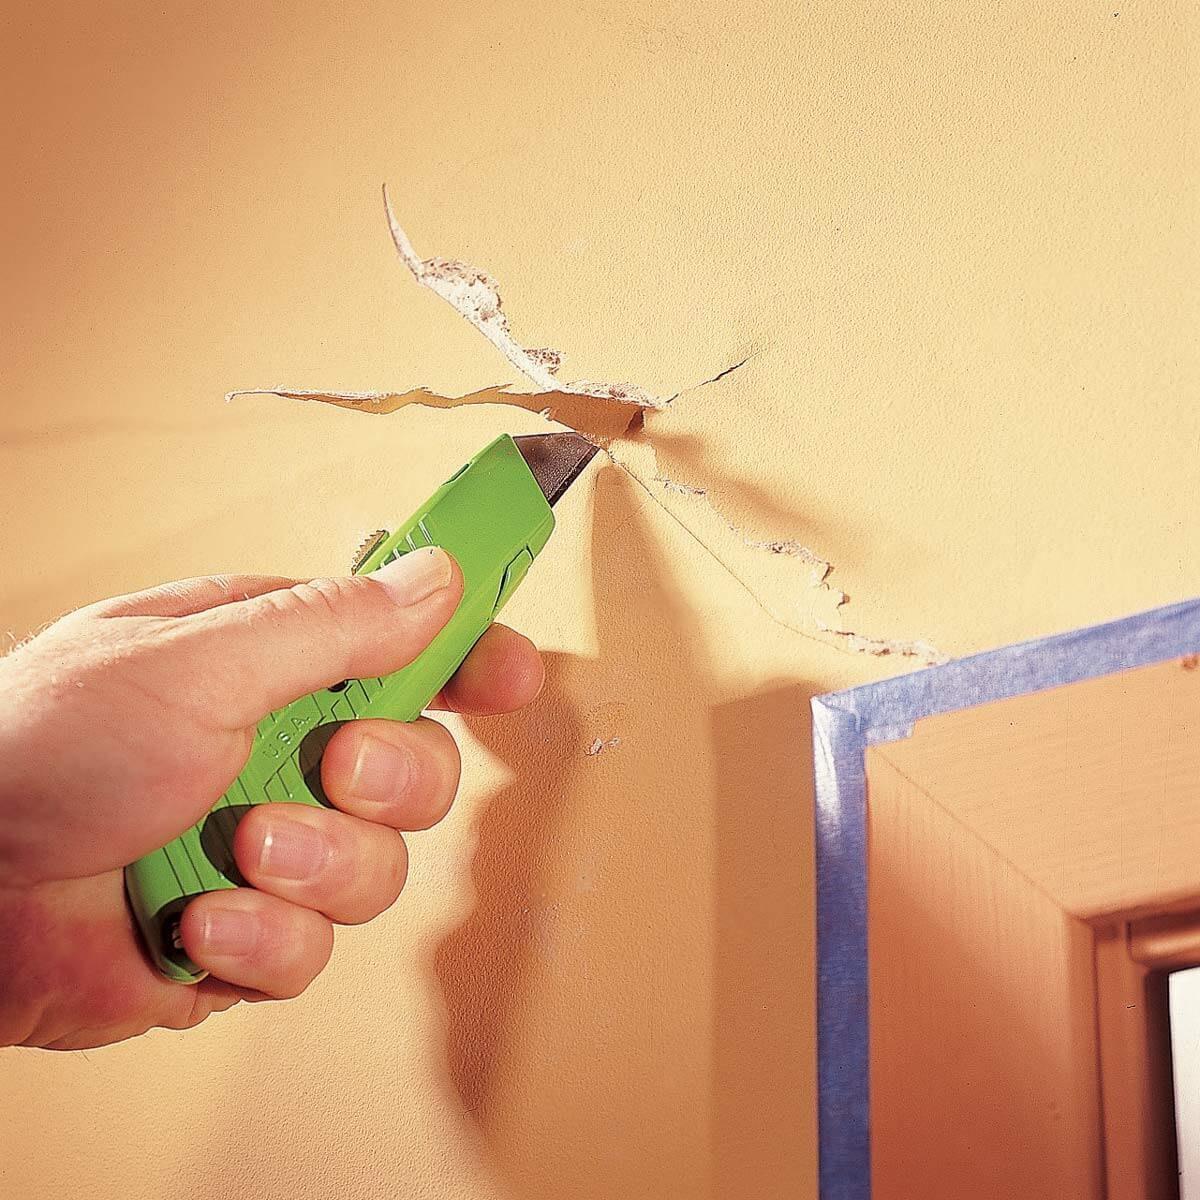 FH03DJA_02848_017 fix a crack in drywall